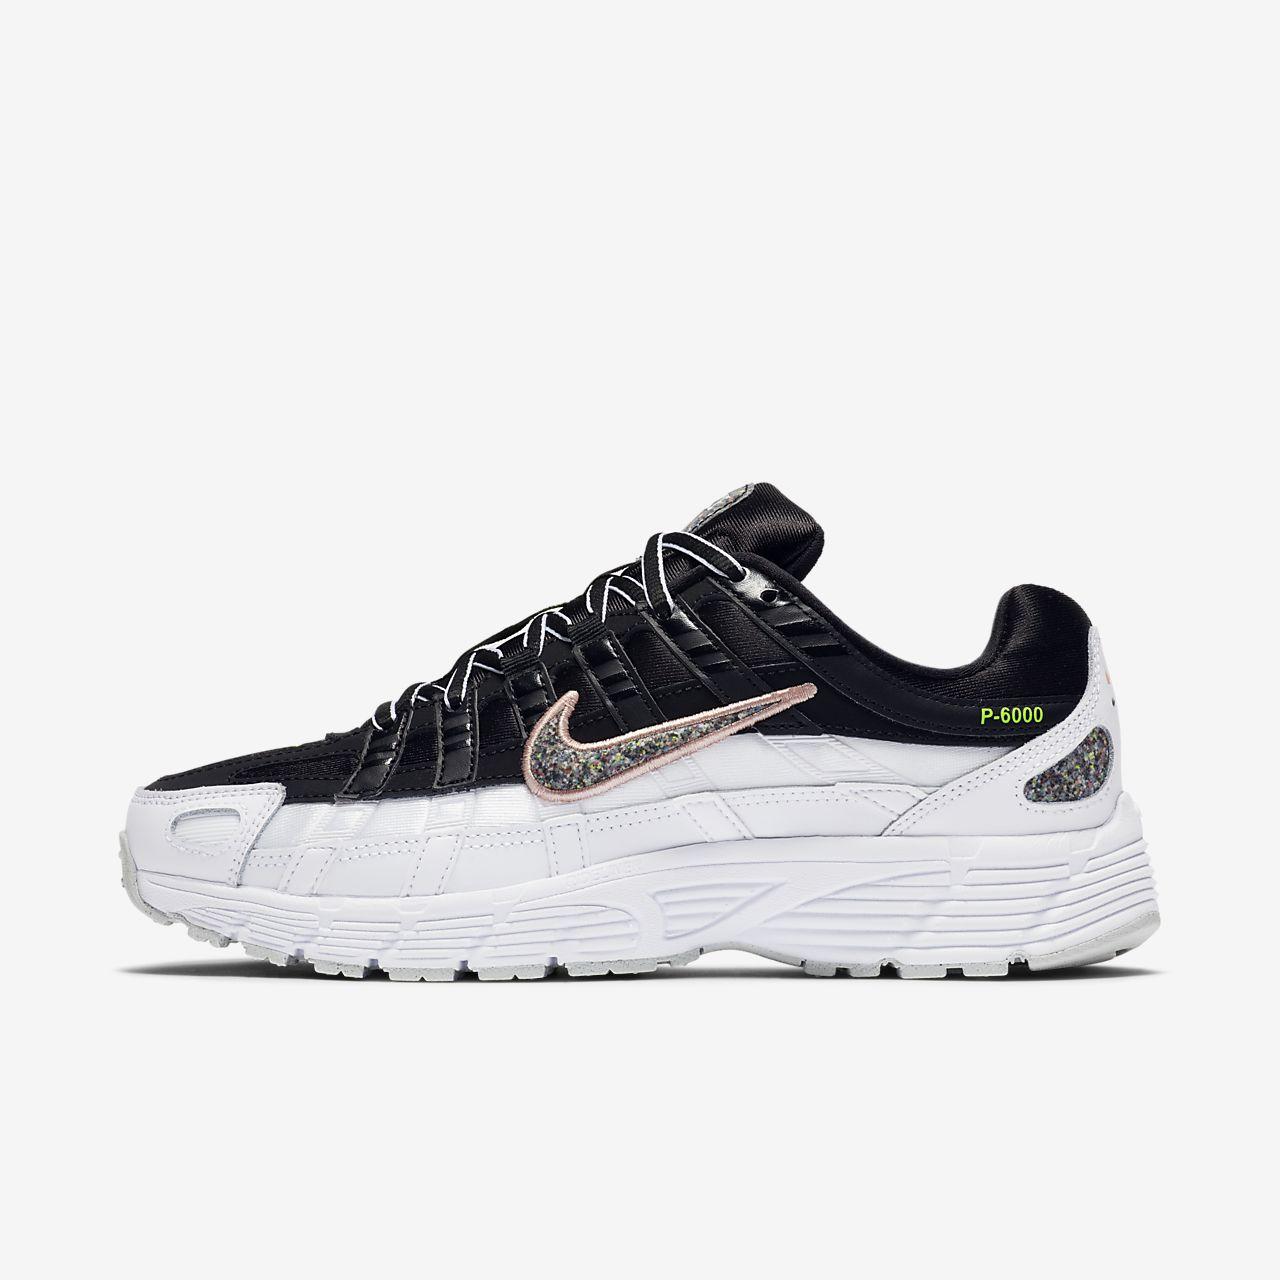 Scarpa Nike P 6000 SE Donna